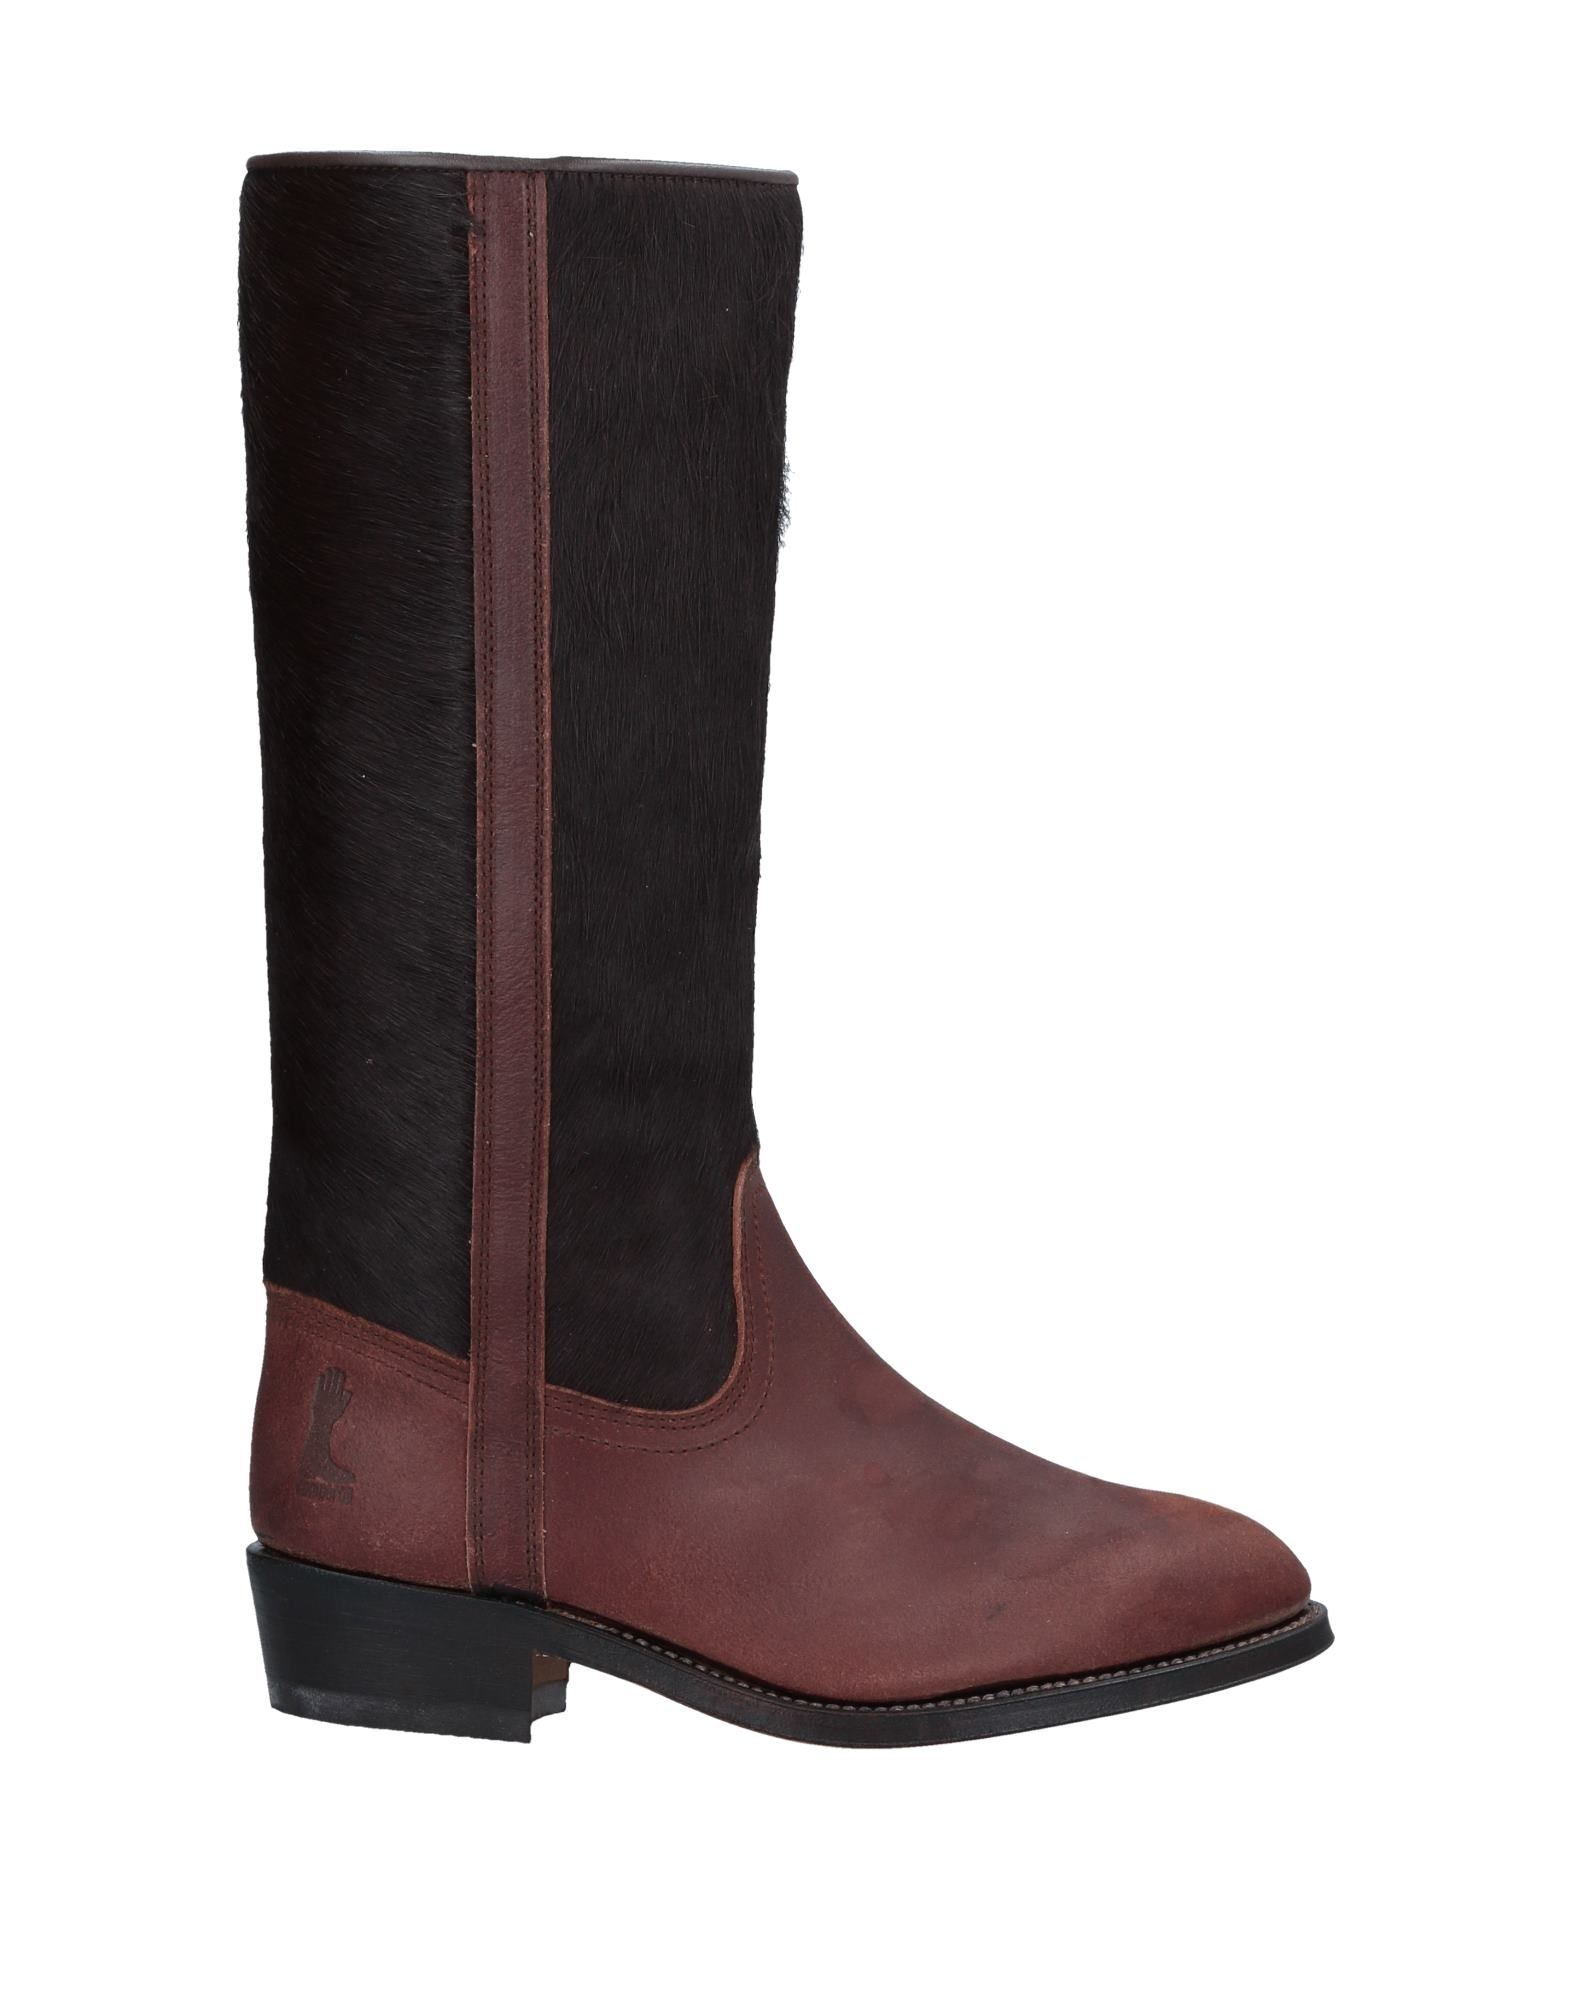 Camperos Boots - Women Camperos United Boots online on  United Camperos Kingdom - 11533318QT 9d51bb